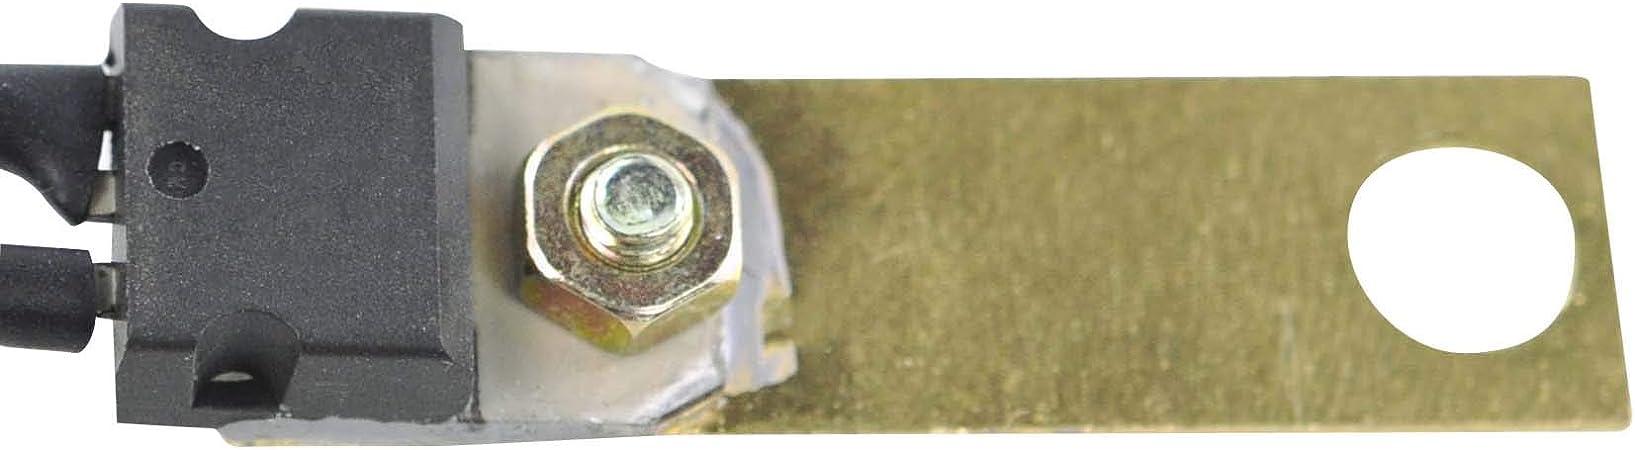 OEM Repl.# 36Y-81970-50-00 Nippon Denso Internal Regulator Fits Yamaha FZX 700 4BH-81970-00-00 FZR 750 1000 1986-1995